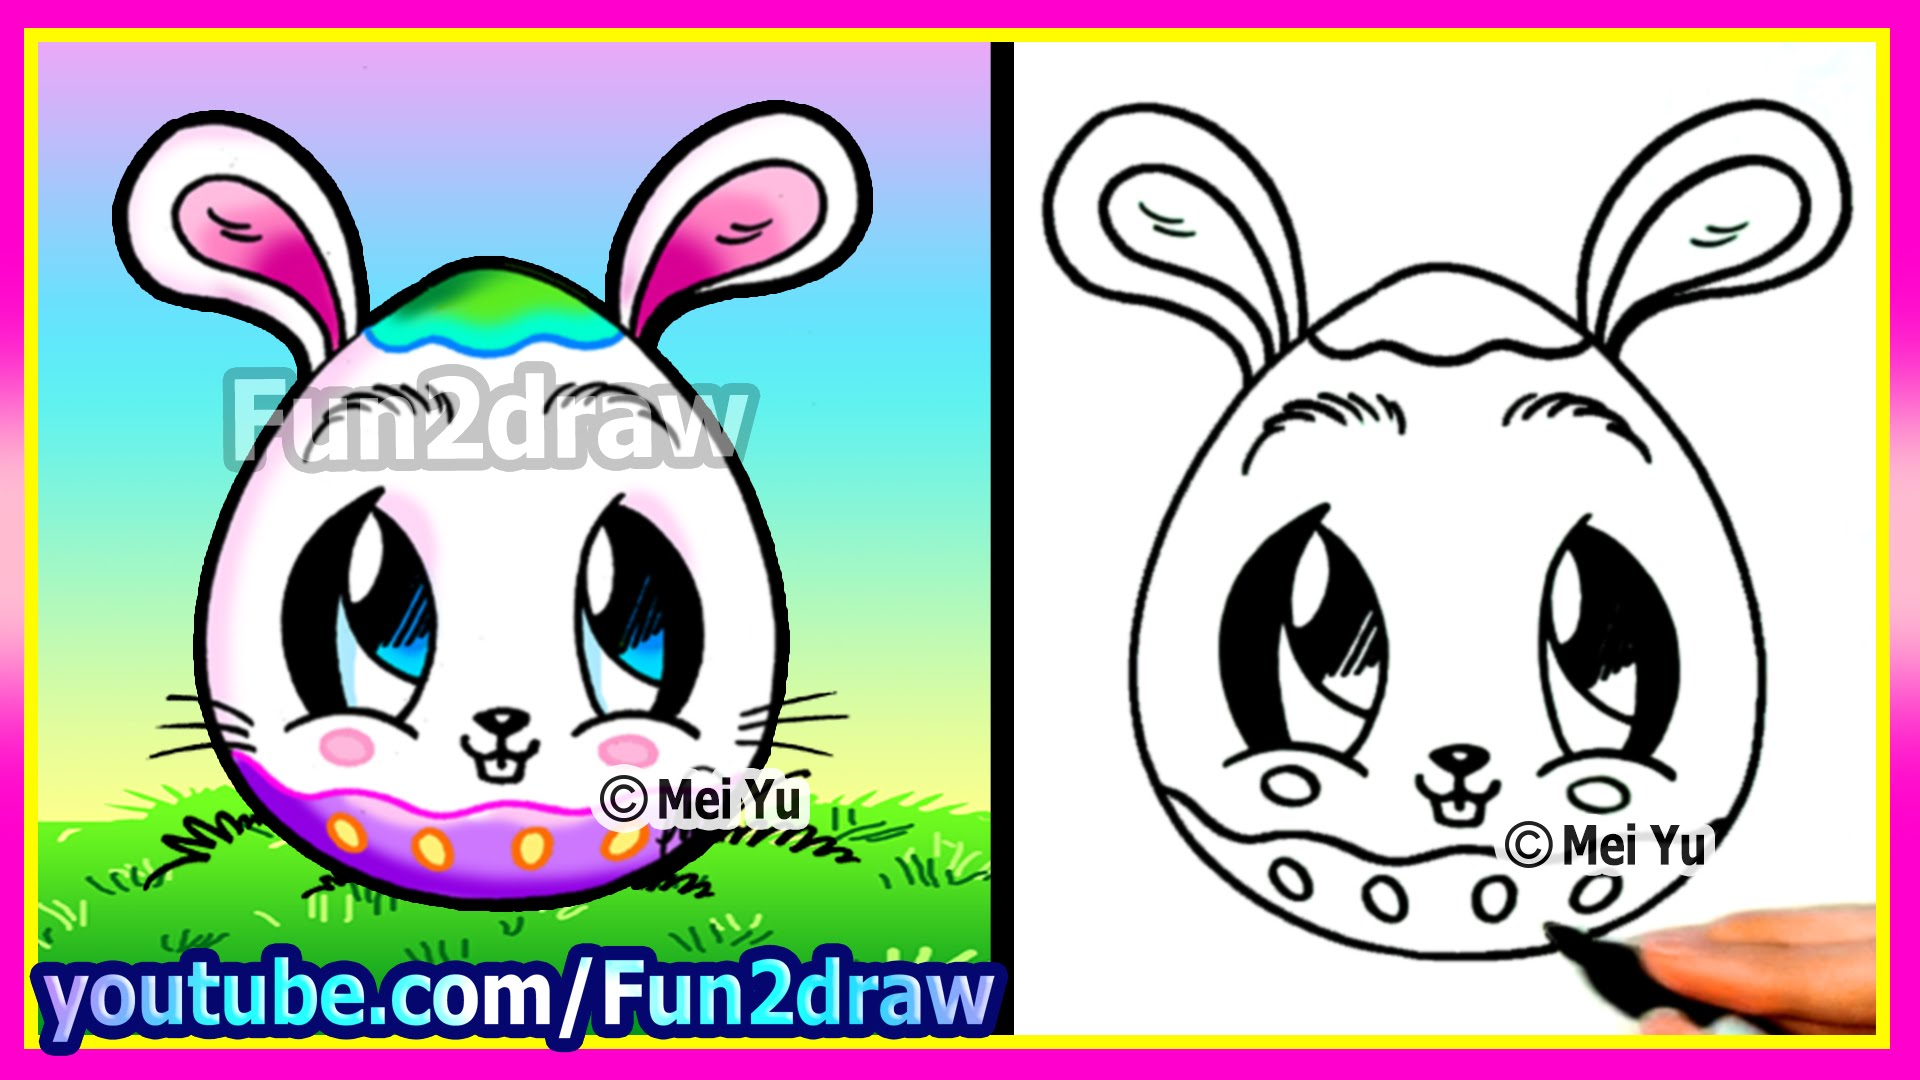 Drawn rabbit youtube easy cartoon Draw A How To Fun2draw